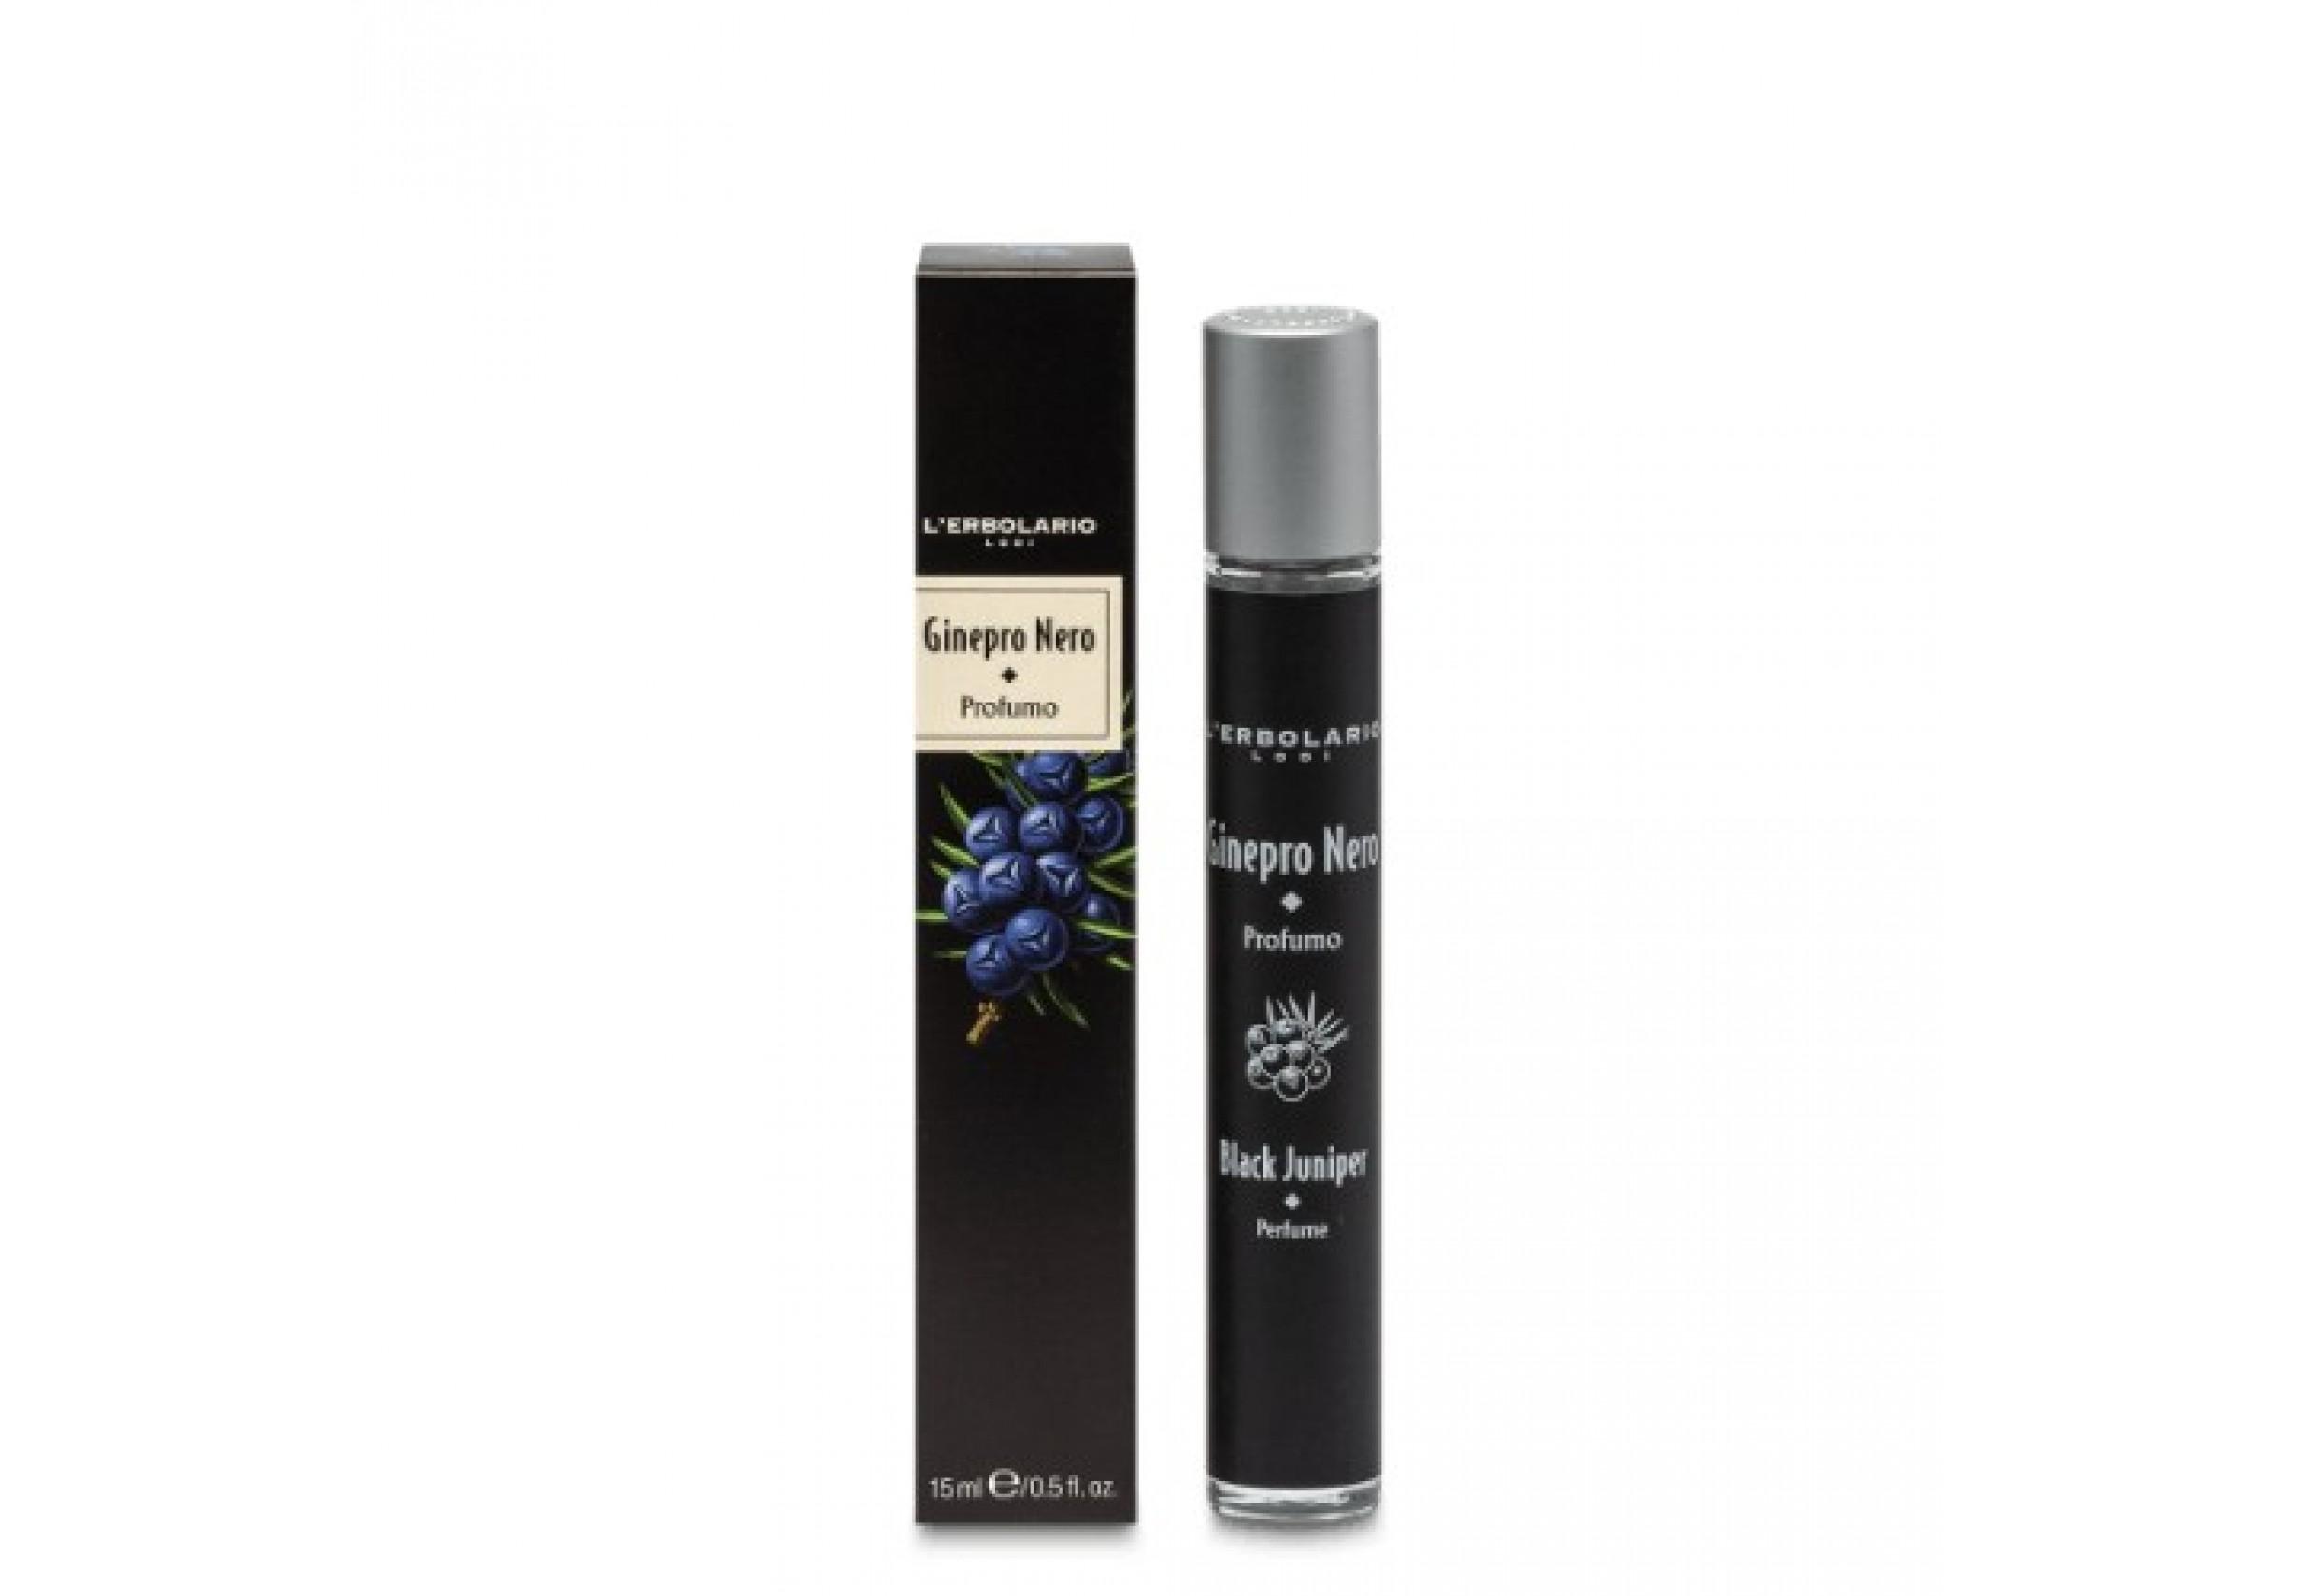 Black juniper - mini perfume for men